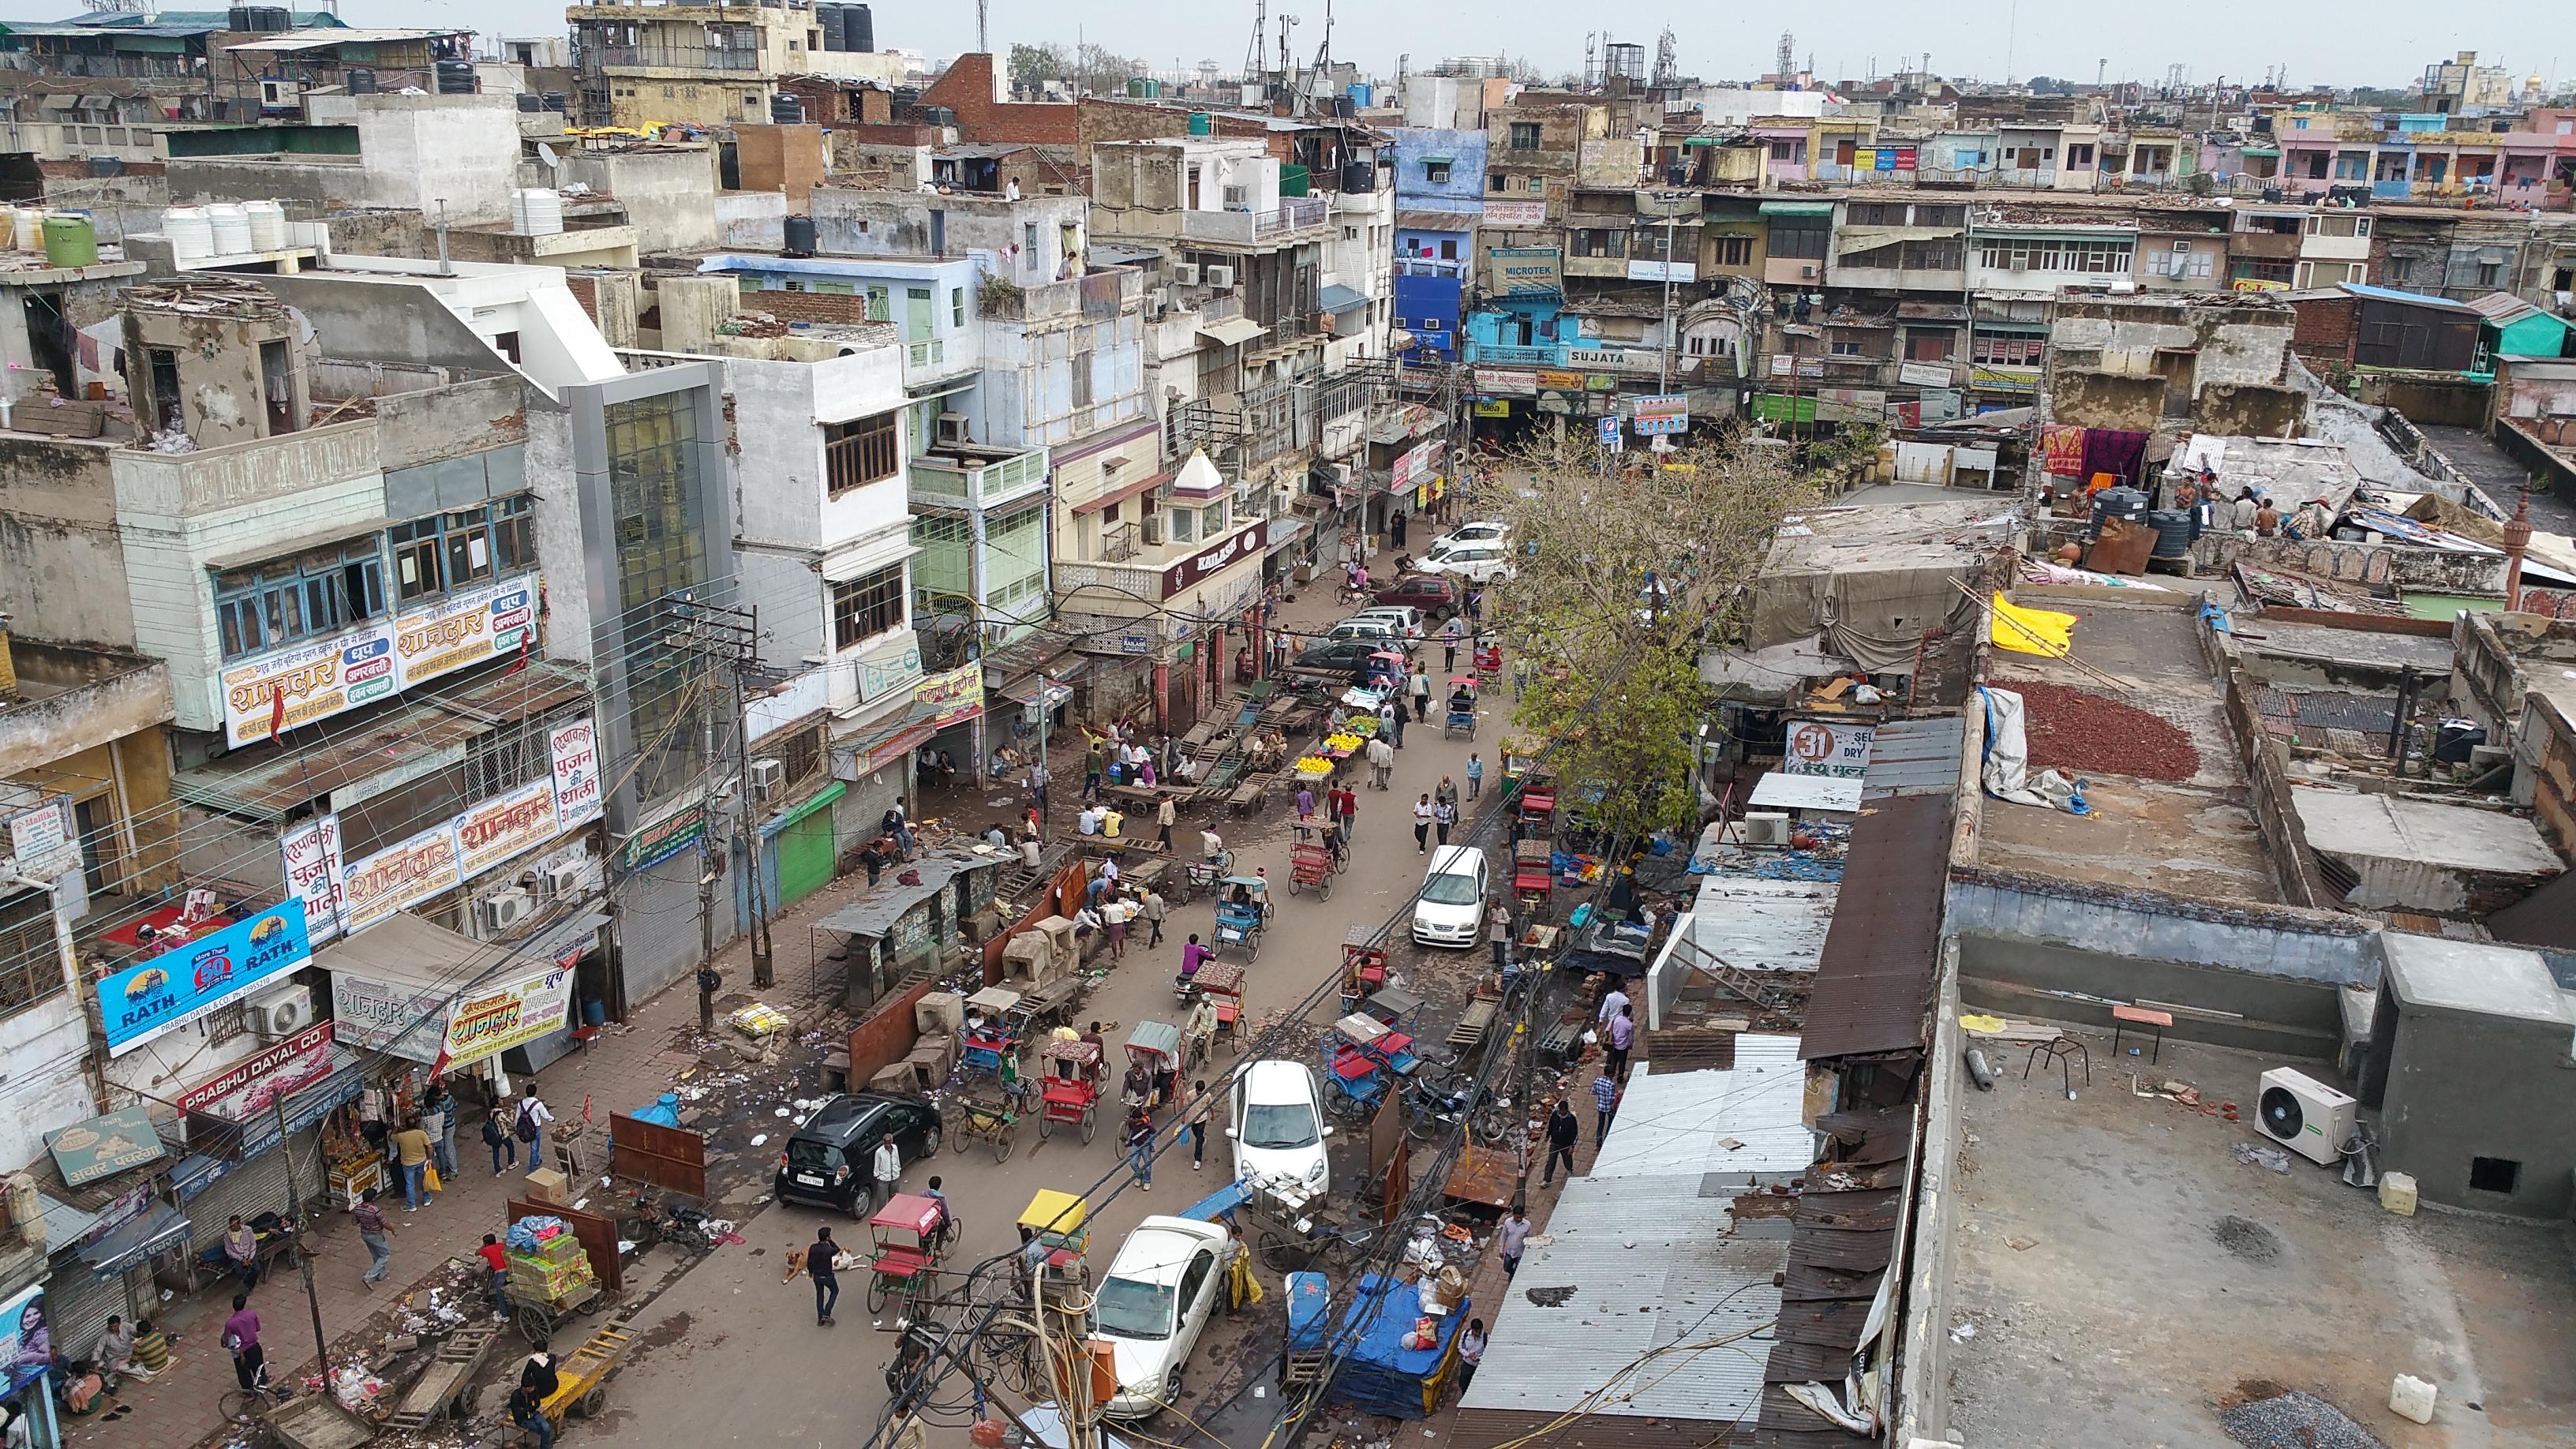 Crowed city in New Dehli, India.